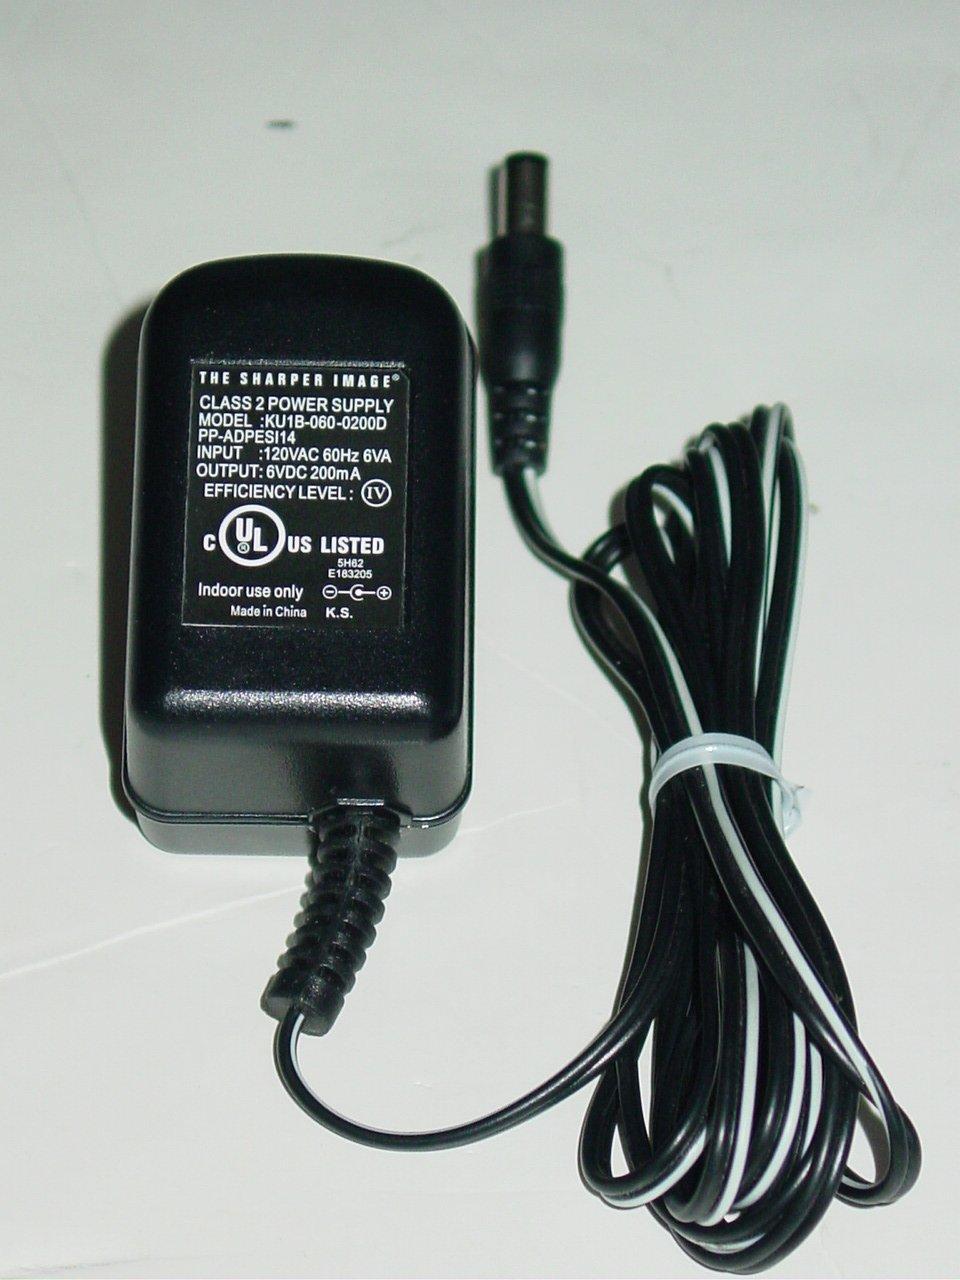 The Sharper Image KU1B-060-0200D AC Adapter PP-ADPESI14 6V 200mA KU1B0600200D